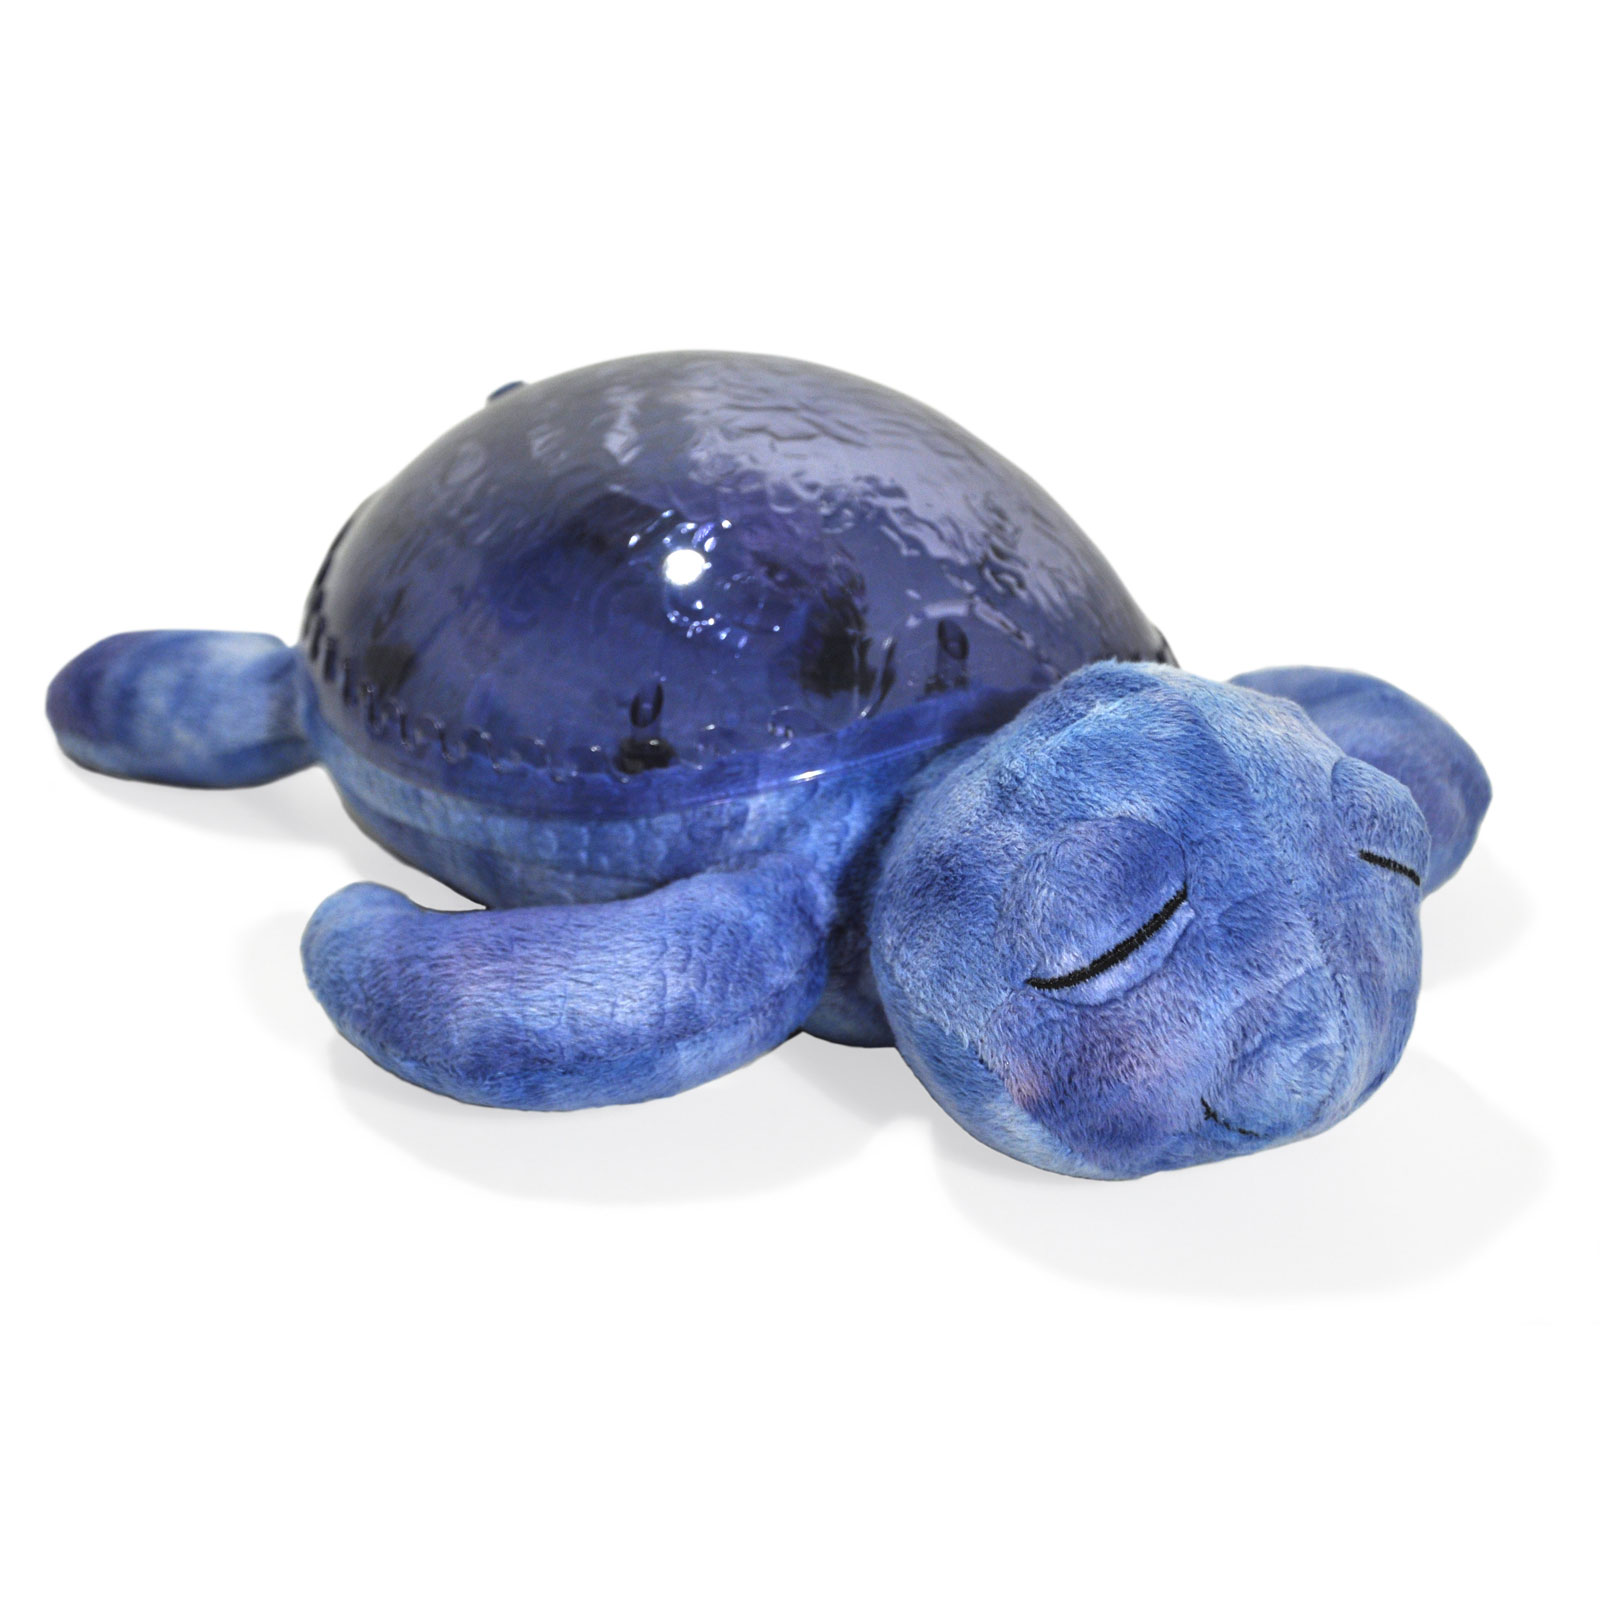 Veilleuse Veilleuse Tranquil Turtle - Ocean Veilleuse Tranquil Turtle - Ocean